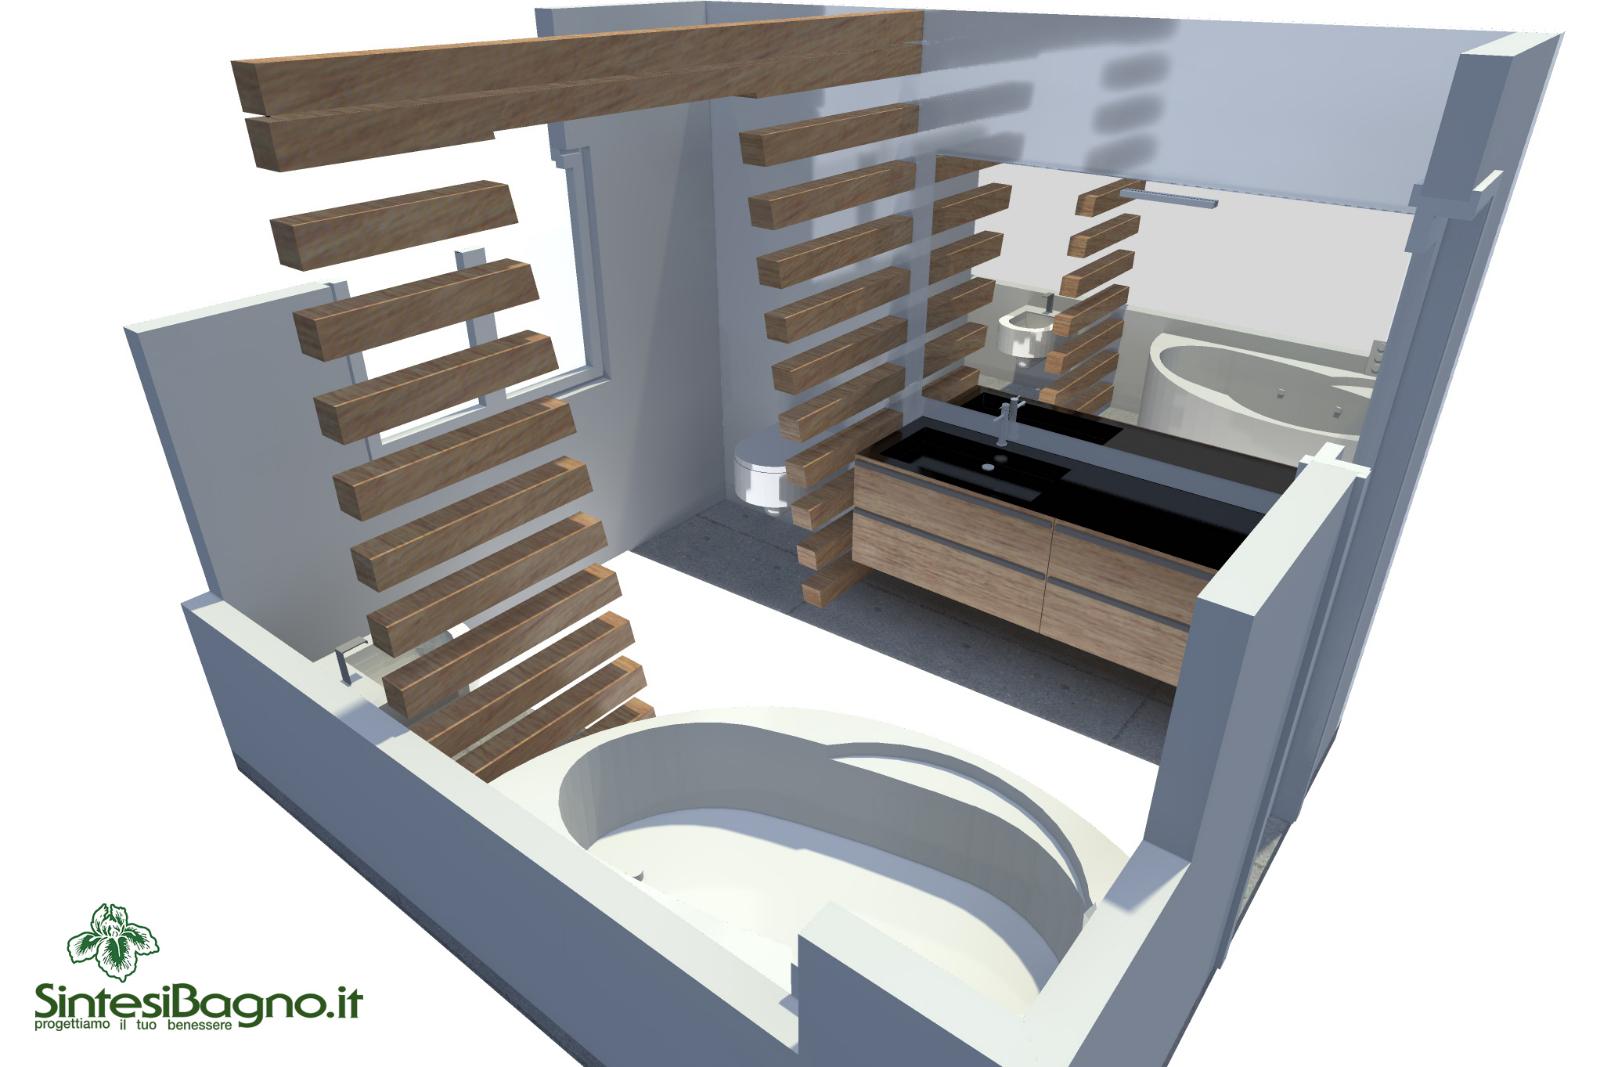 Vasche Da Bagno Da Incasso Novellini : Progetti arredobagno vasca da bagno novellini modello vogue